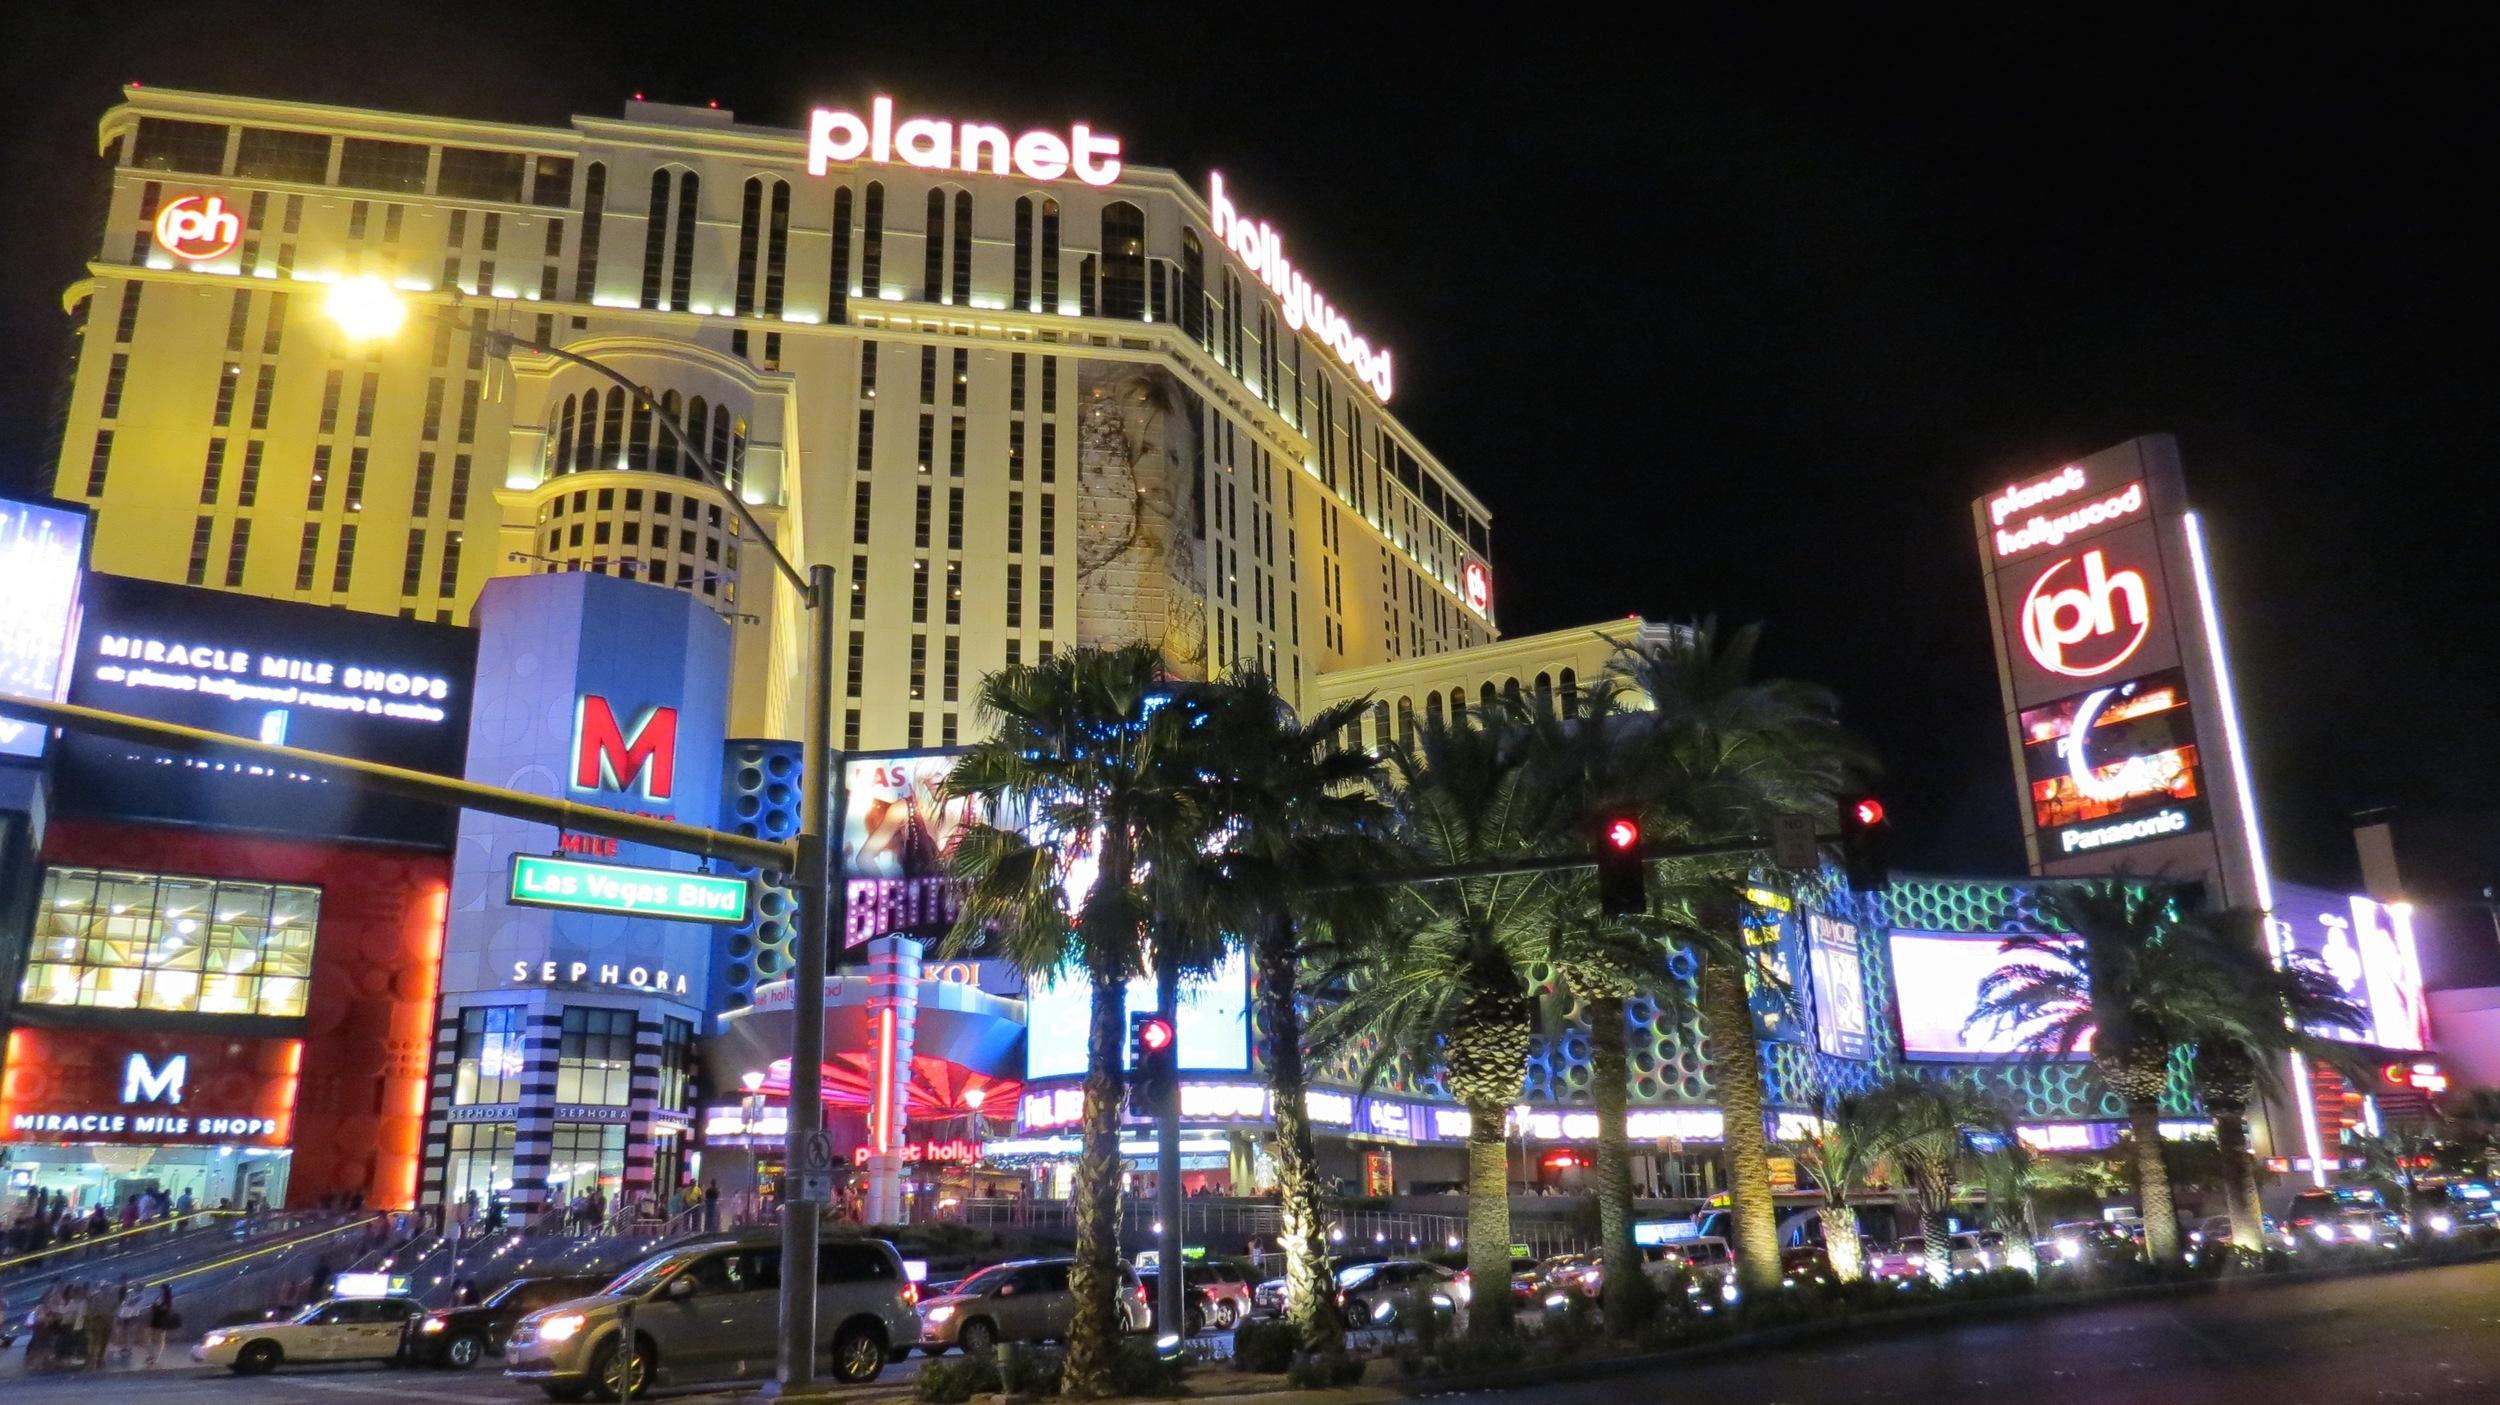 The sensational Planet Hollywood Resort & Casino, right on the Las Vegas strip. So many lights!